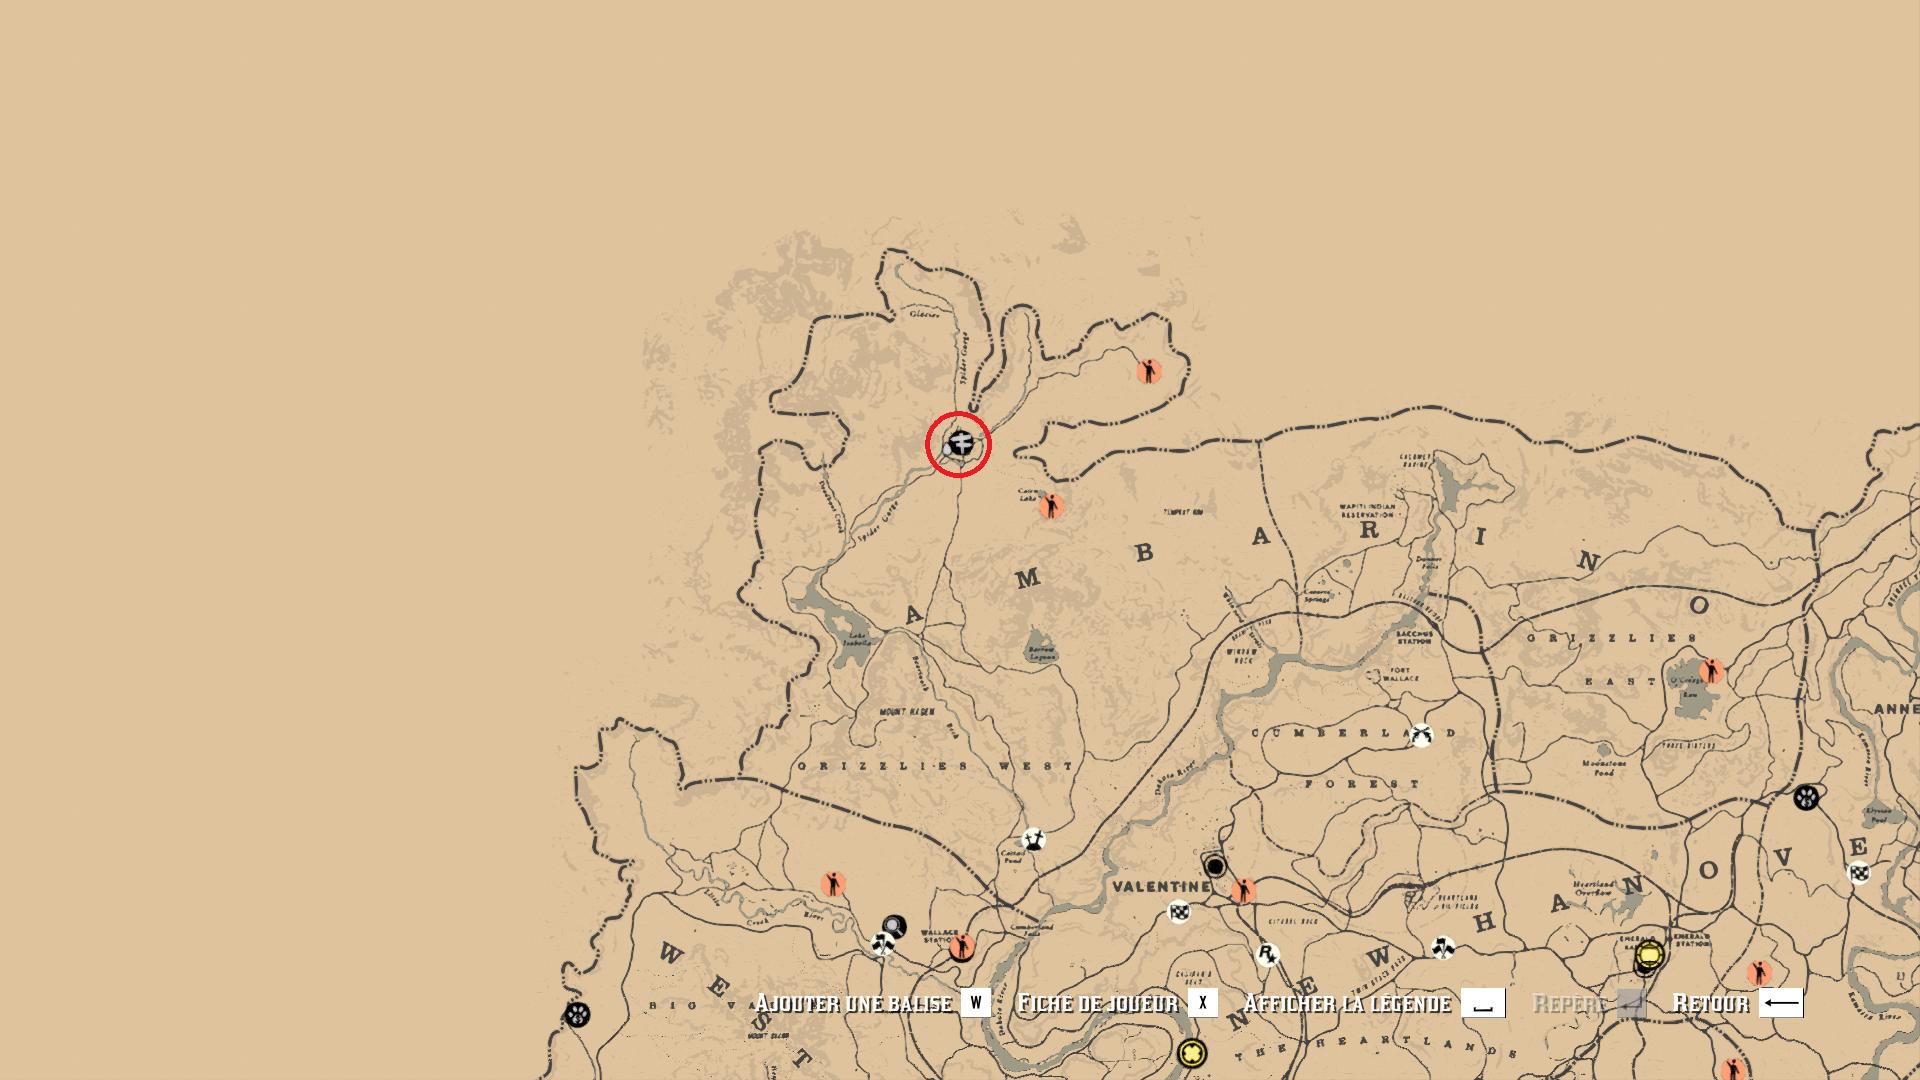 colter-carte-lieu-rdr2-red-dead-redemption-2-online